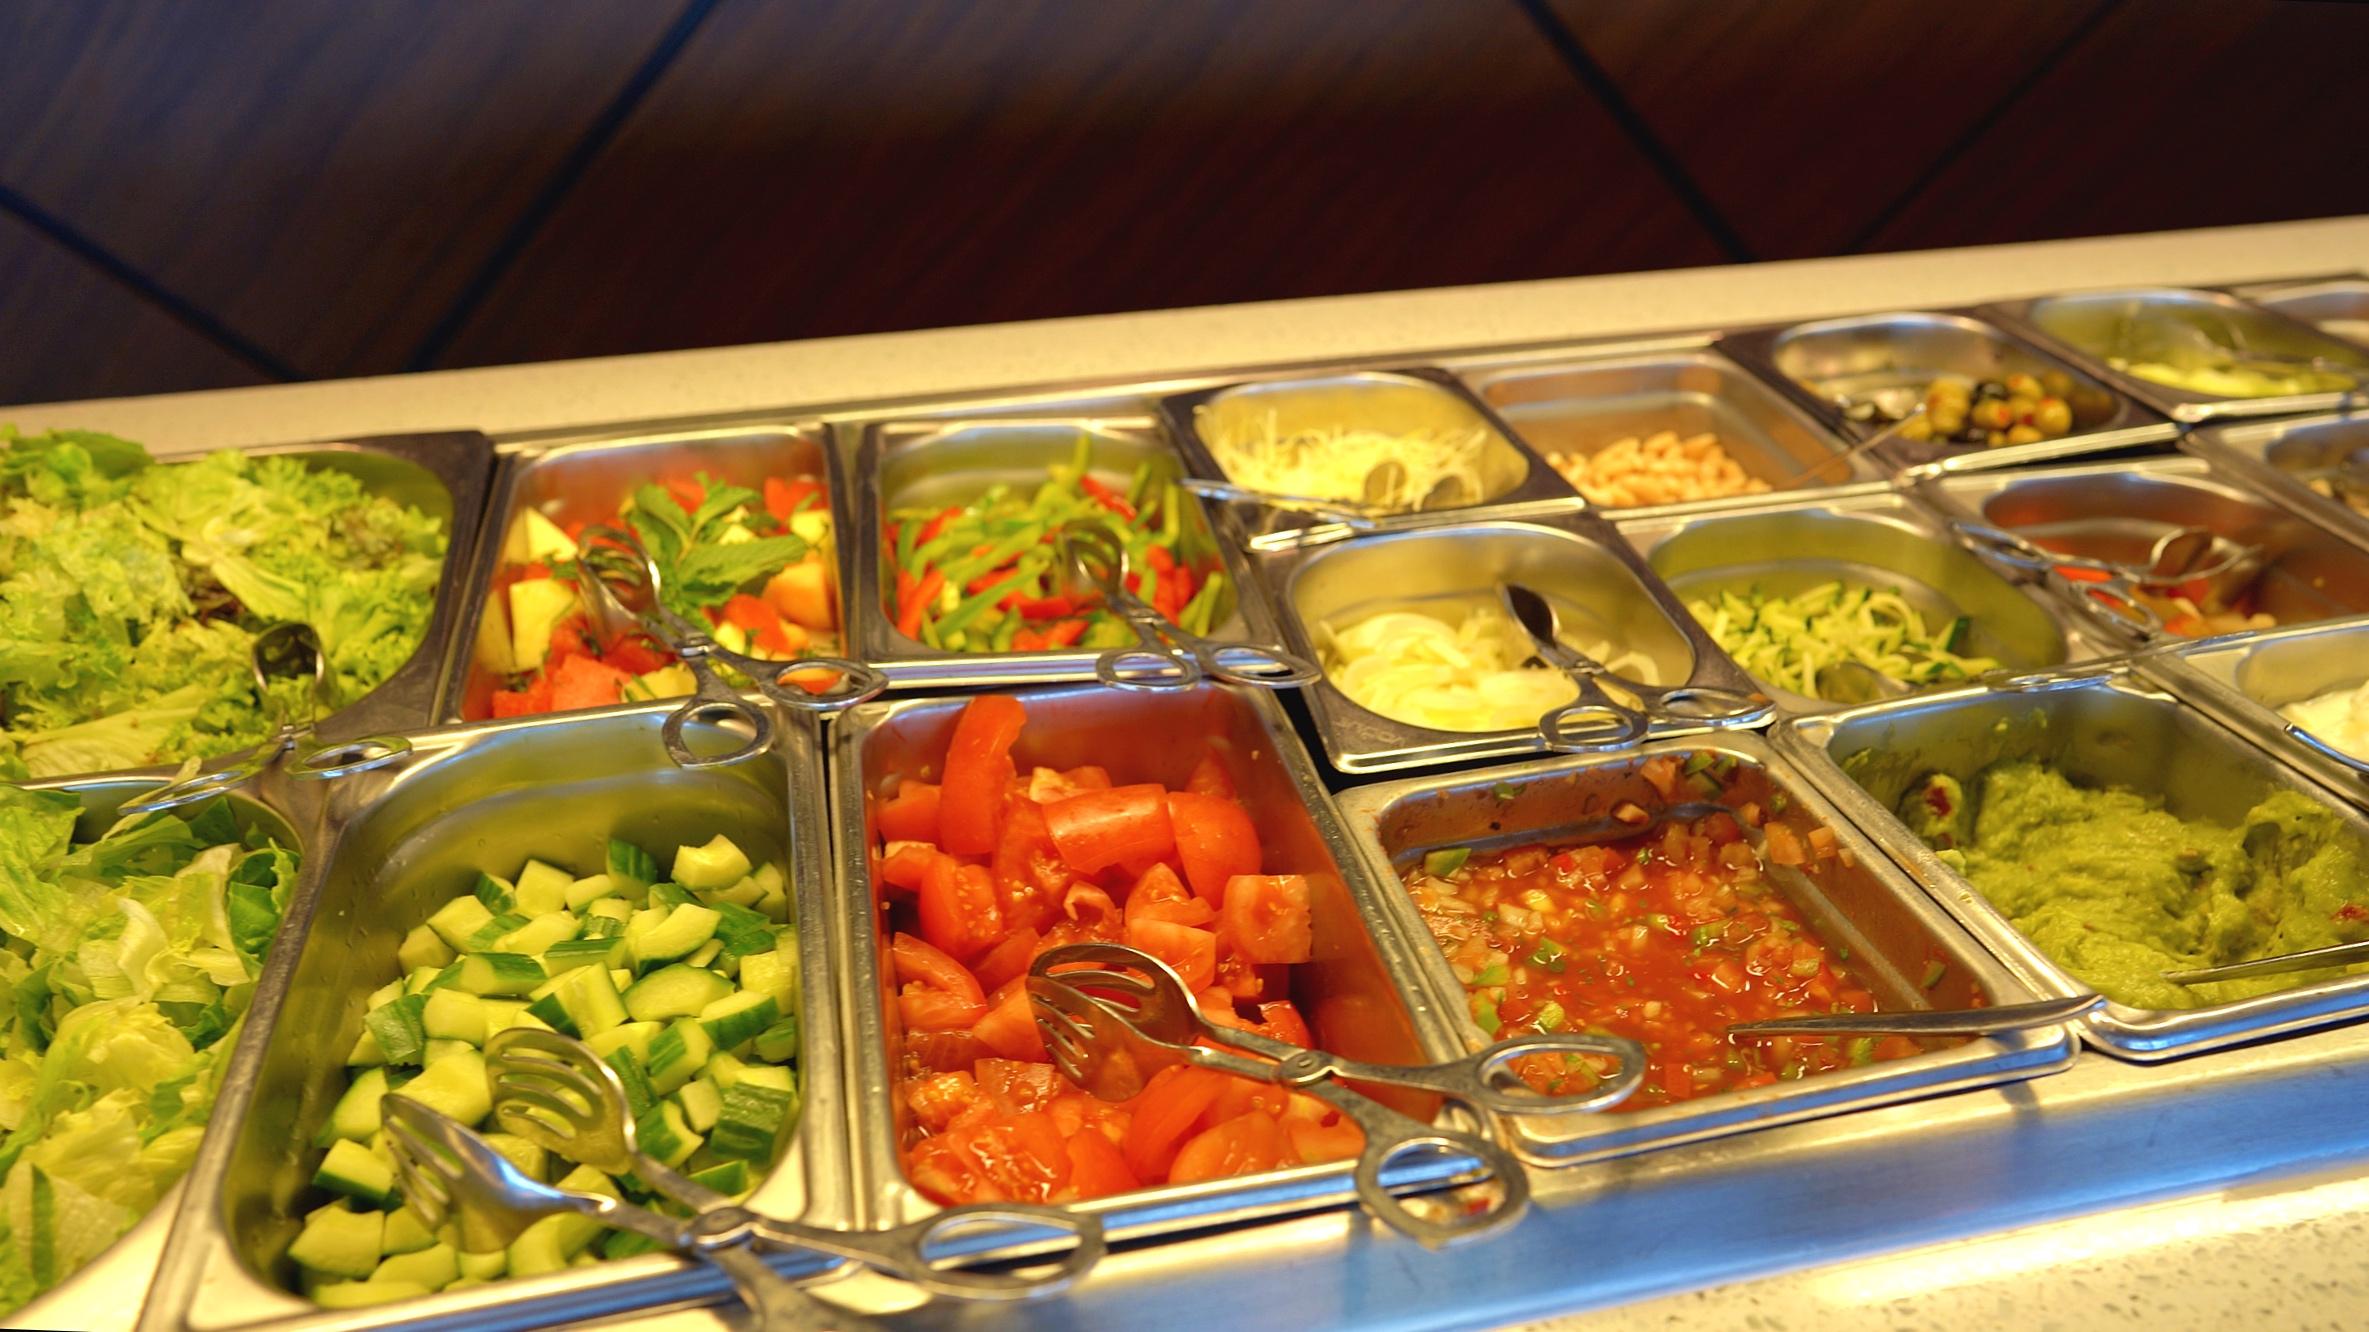 The Patio salad bar